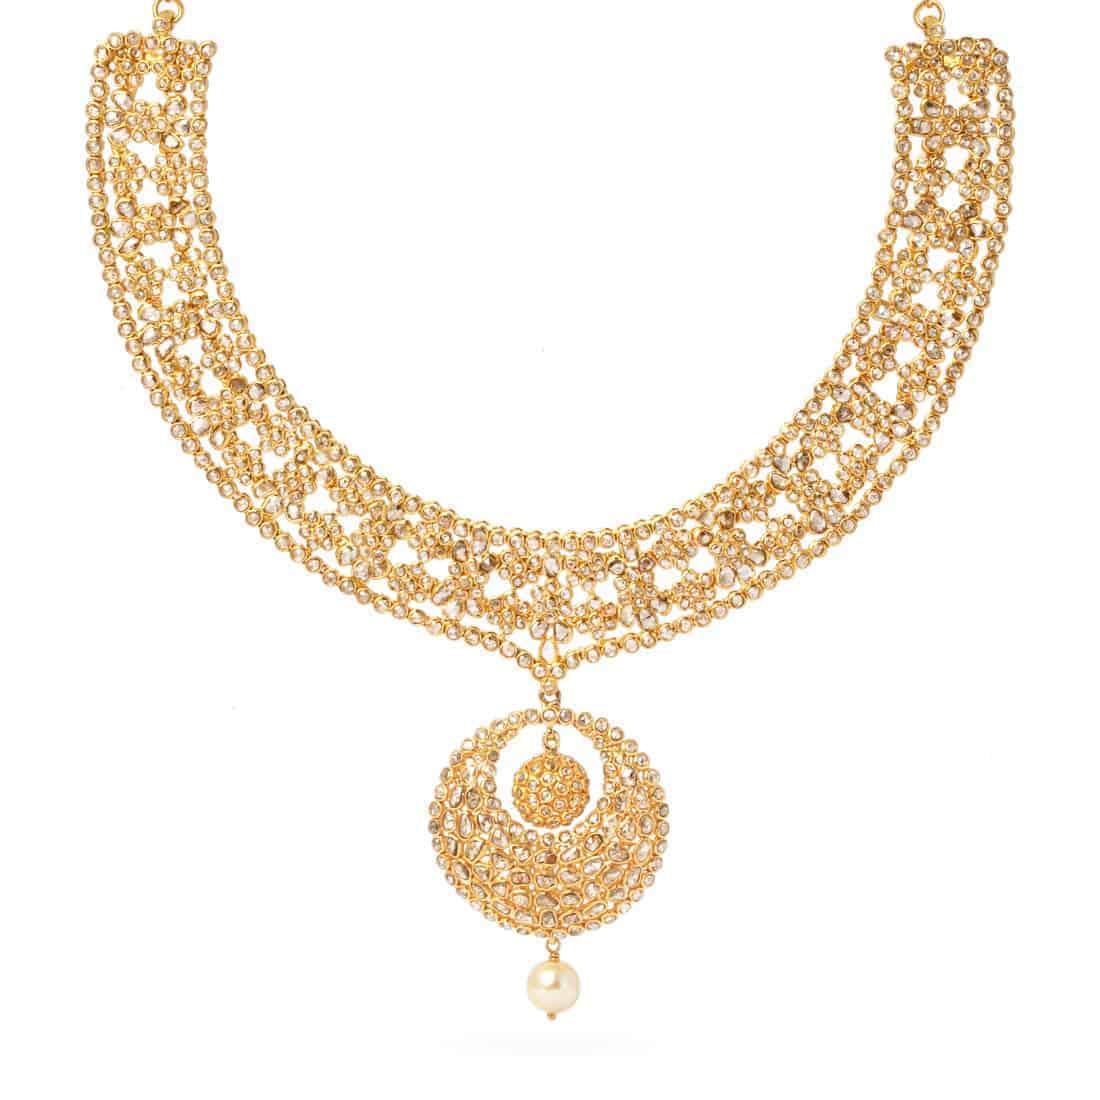 22178 - Diya 22ct Gold Uncut Polki Diamond Necklace